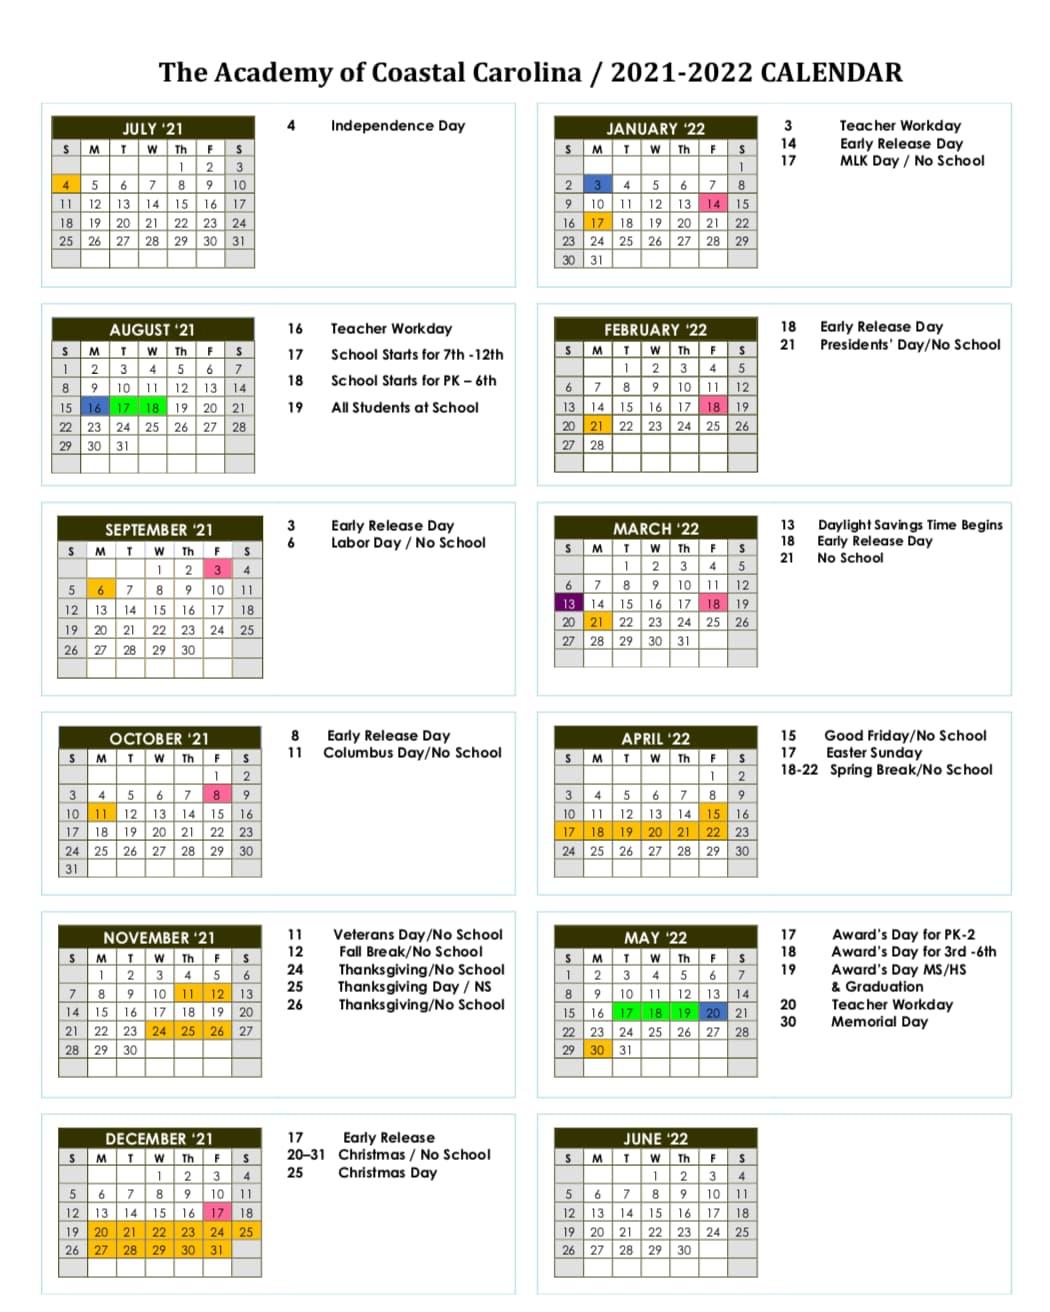 The academy of coastal carolina academic calendar